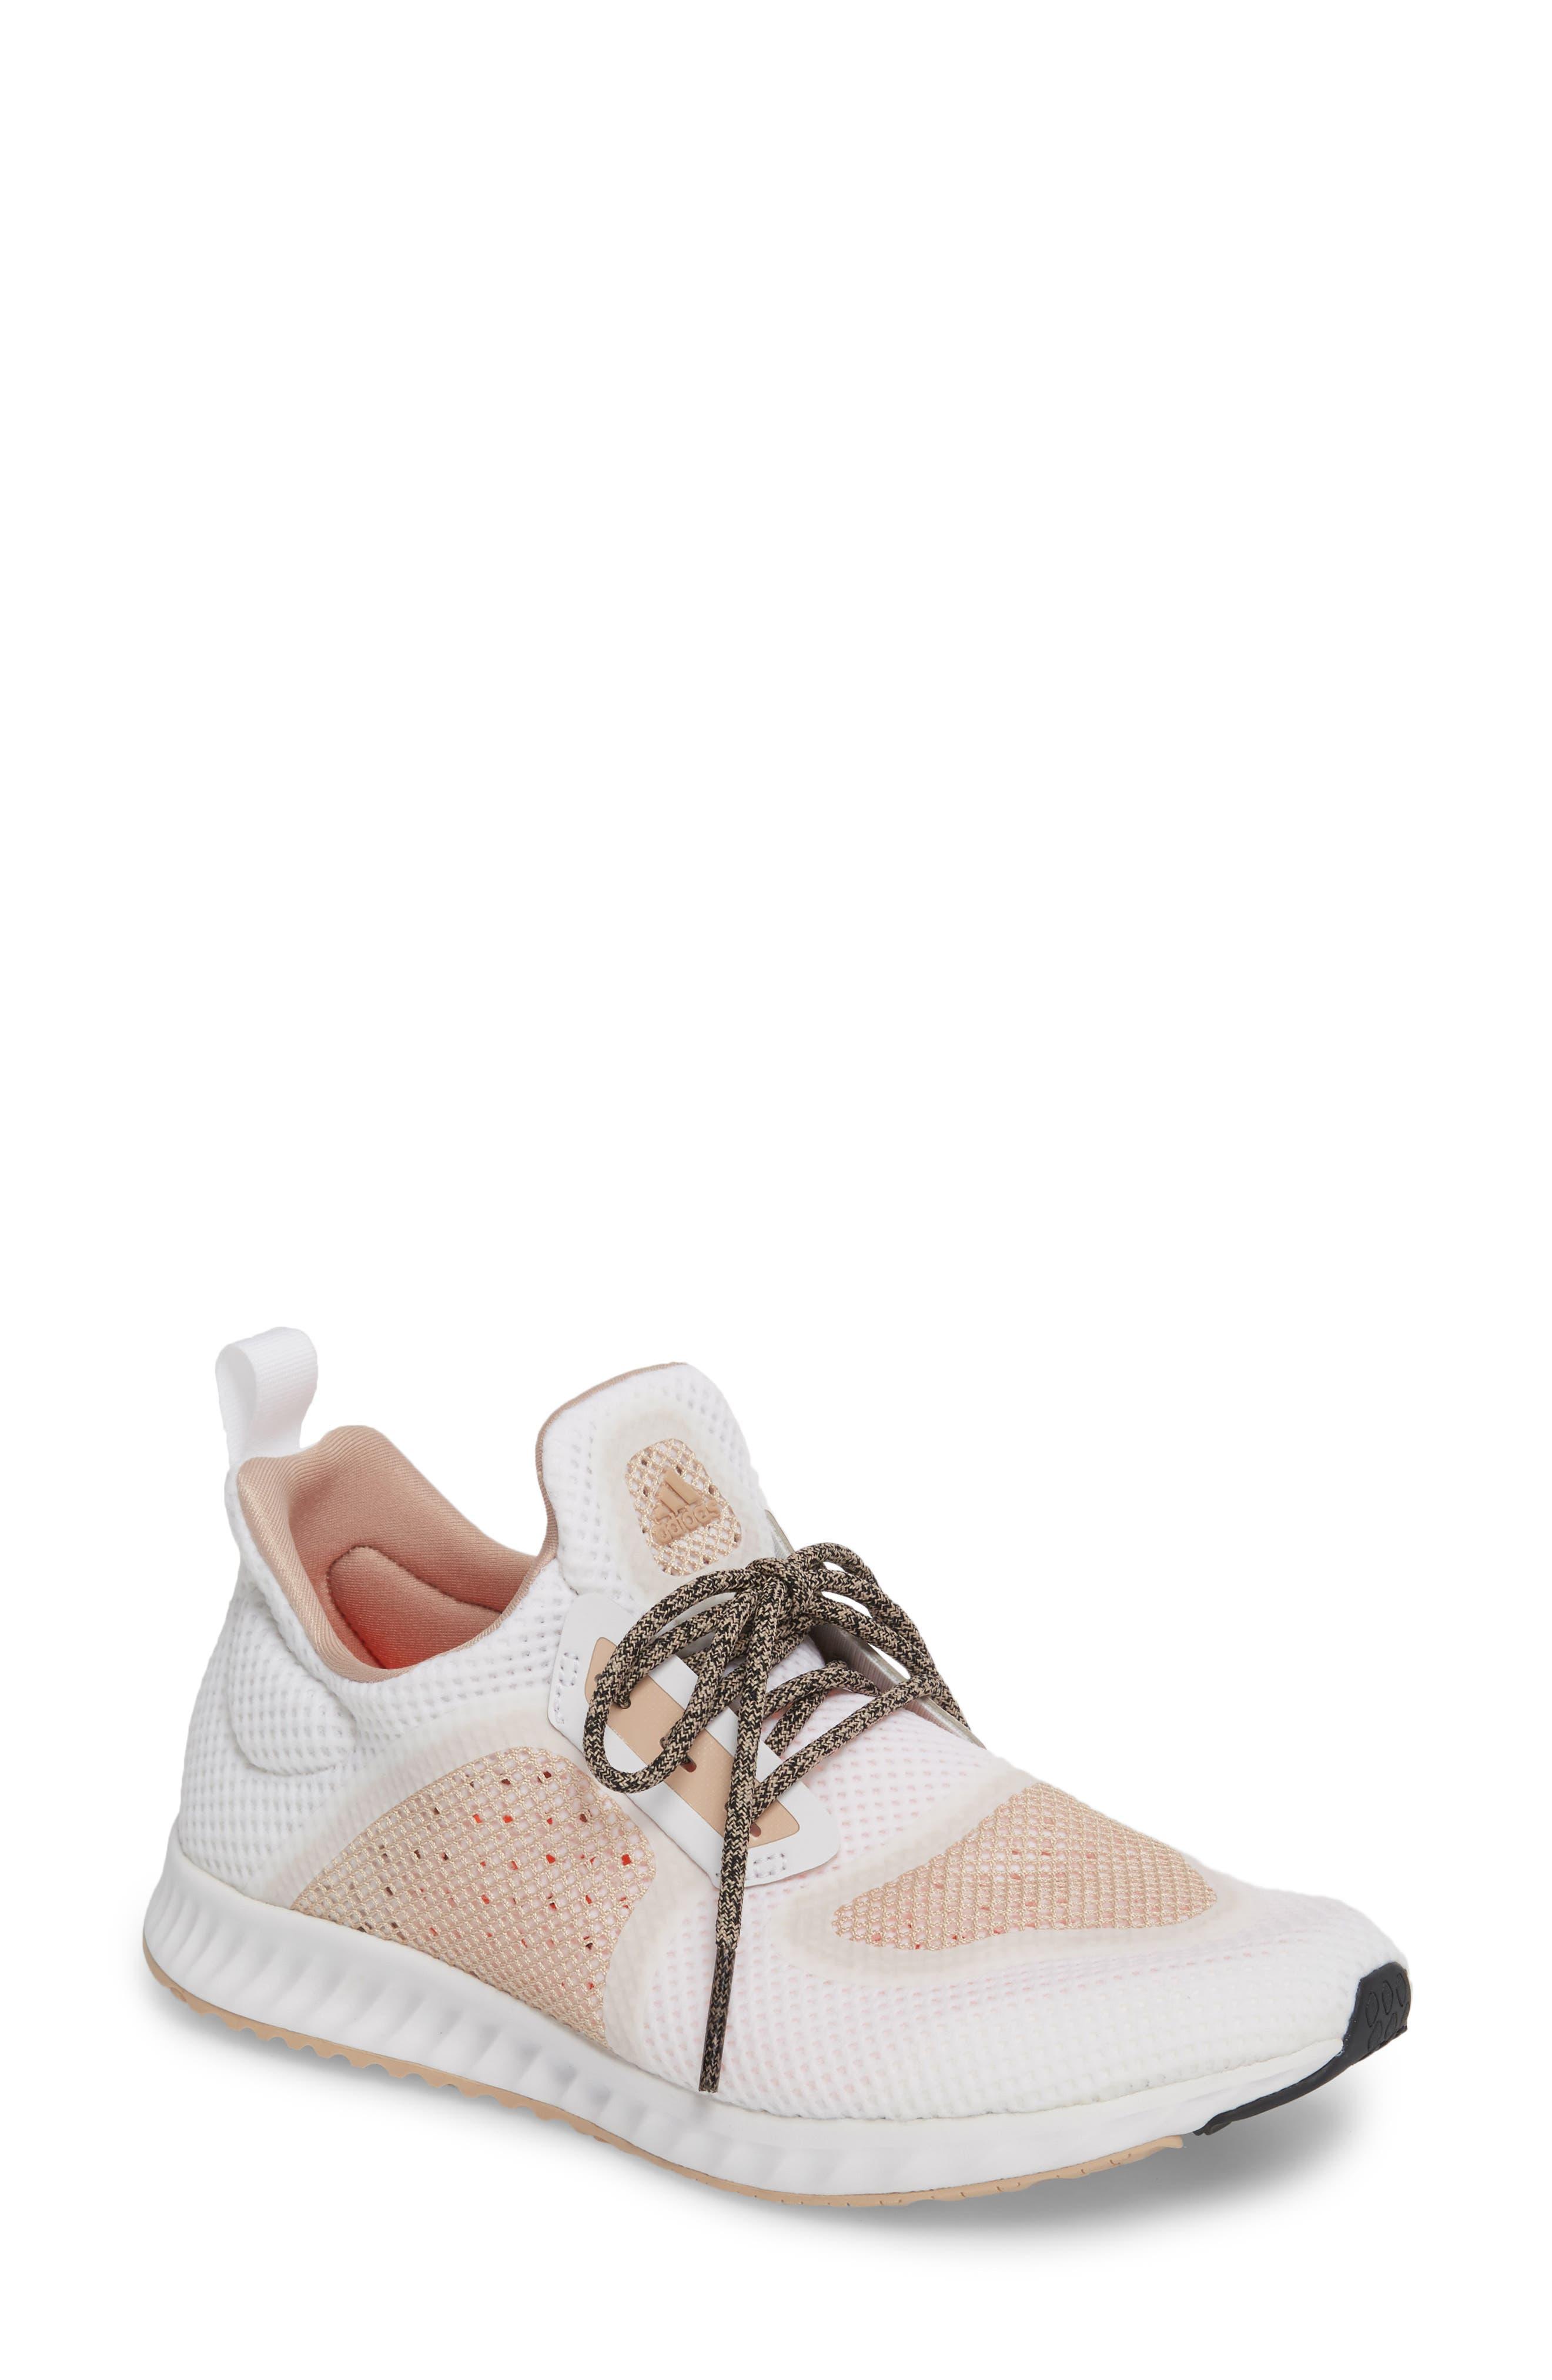 adidas Edge Lux Clima Running Shoe (Women)